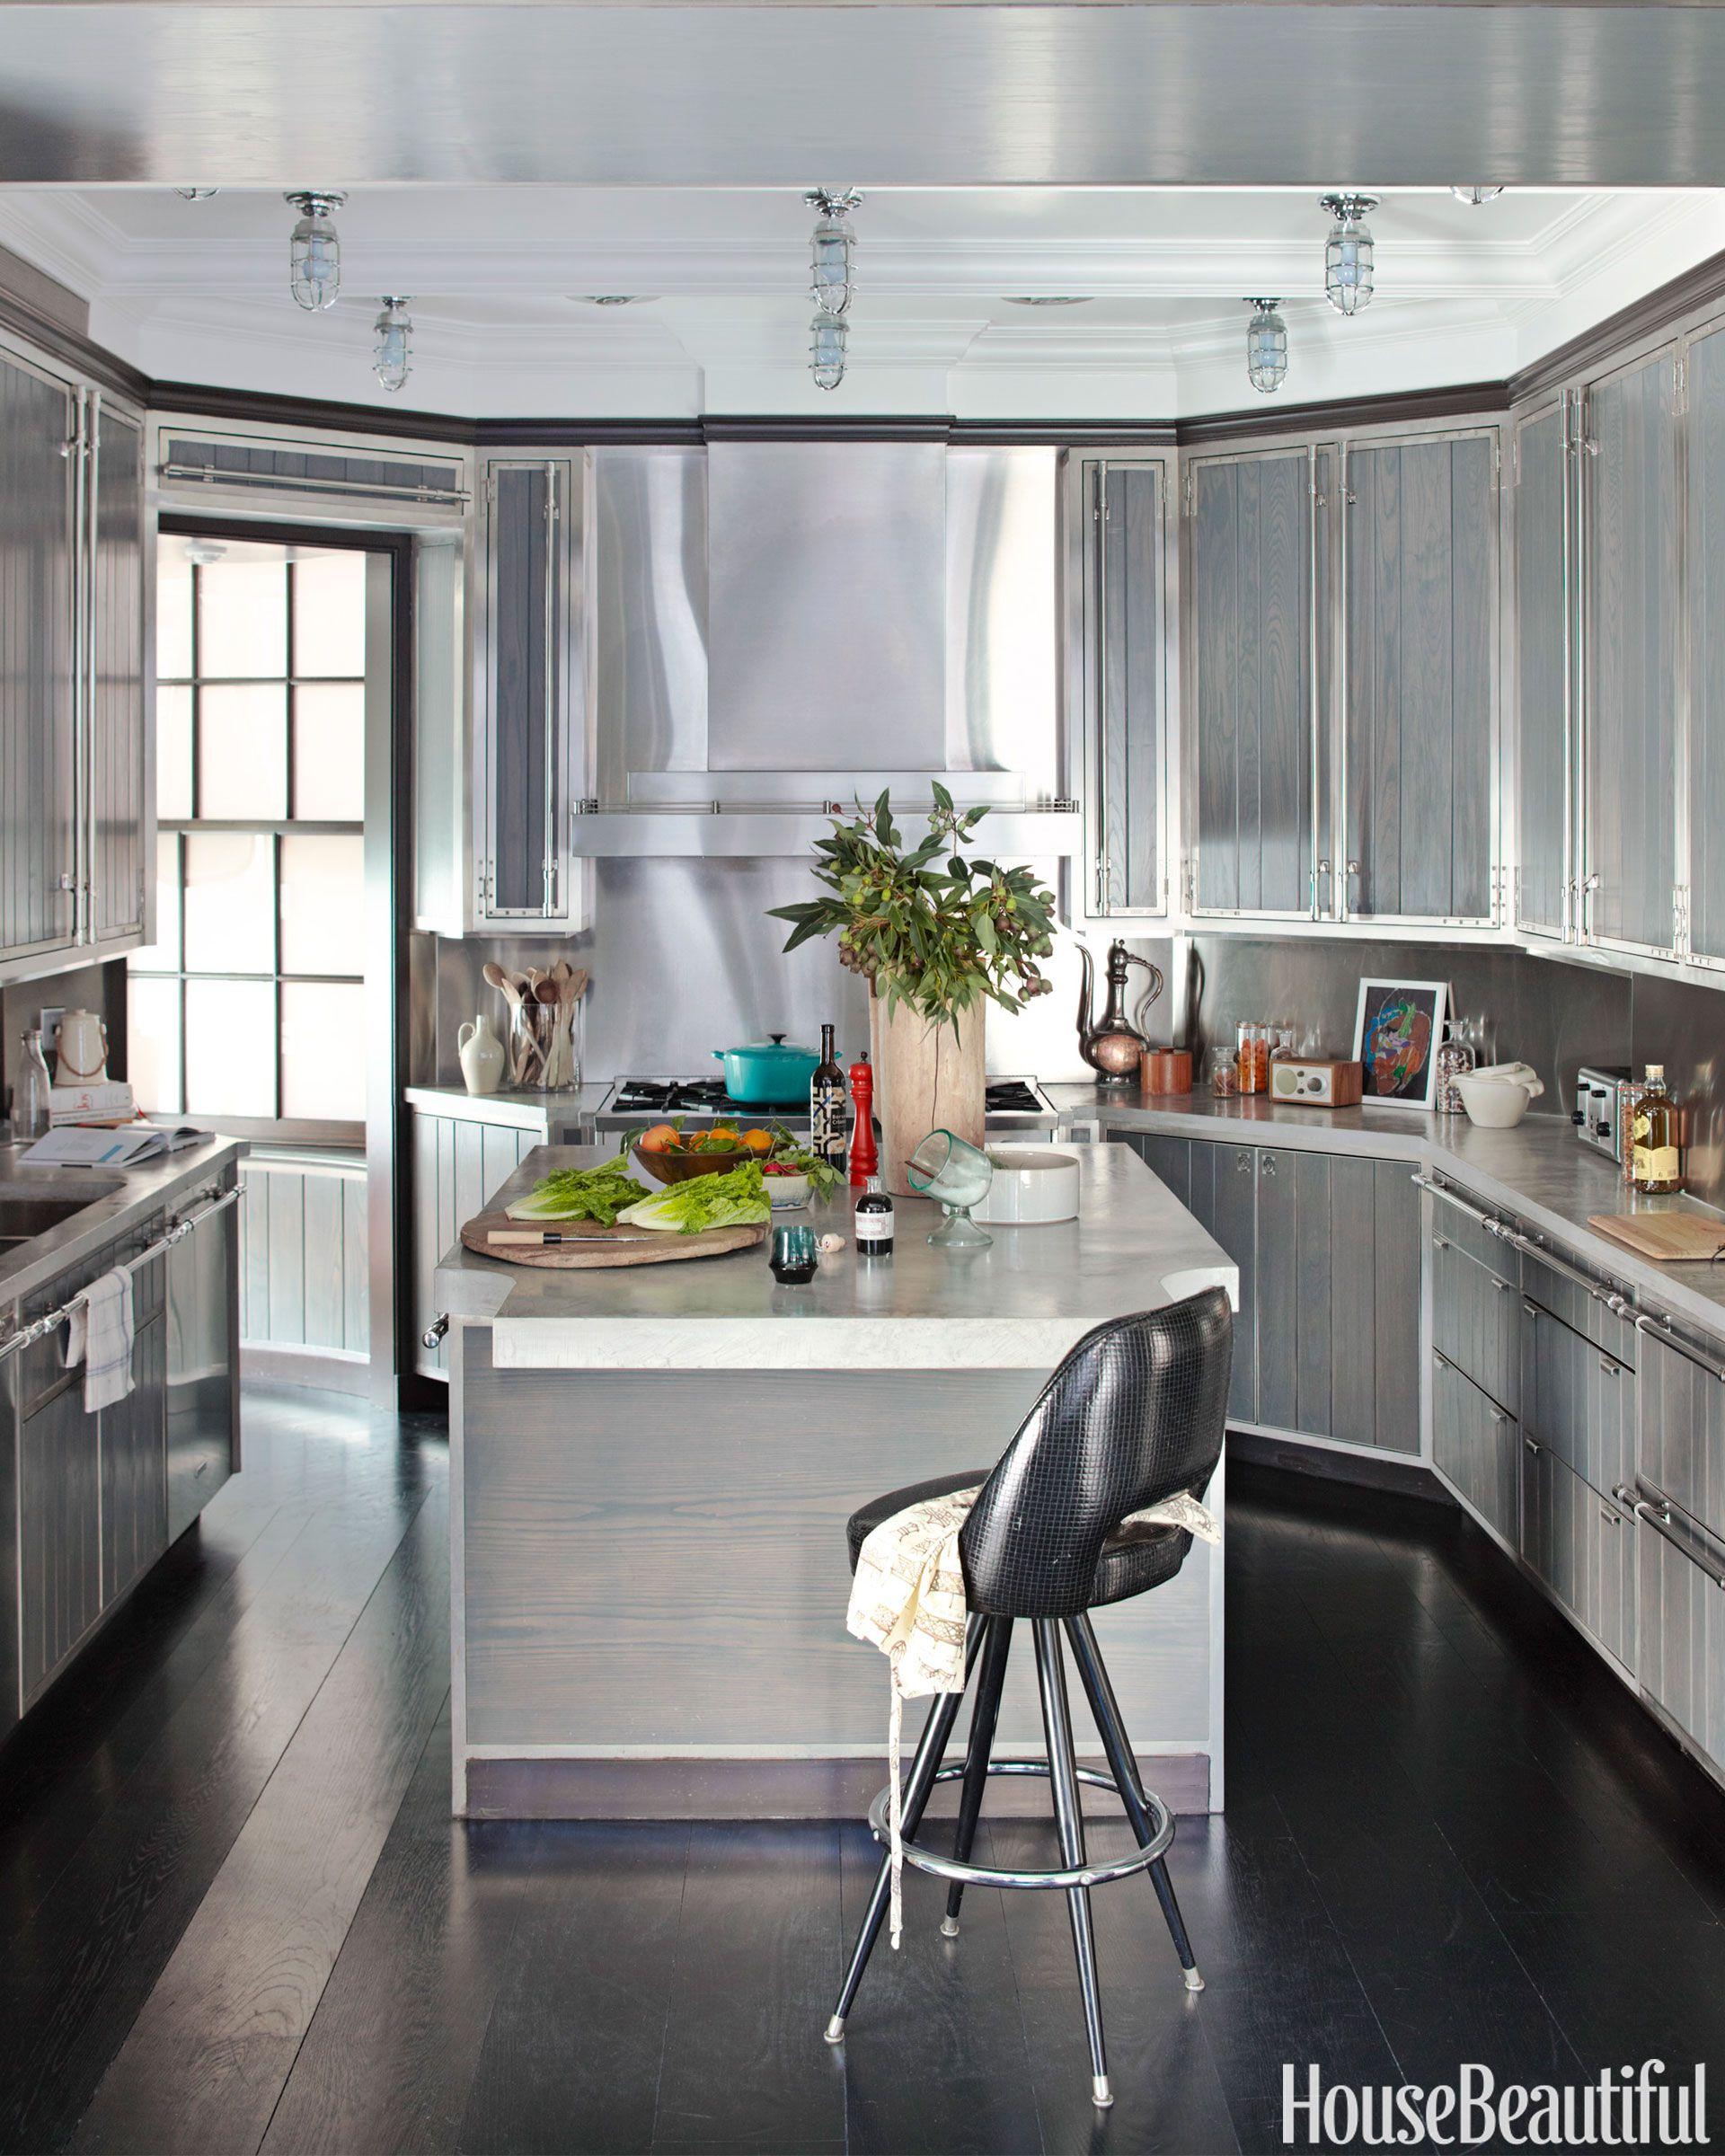 Creative Kitchens - Unique Kitchen Designs